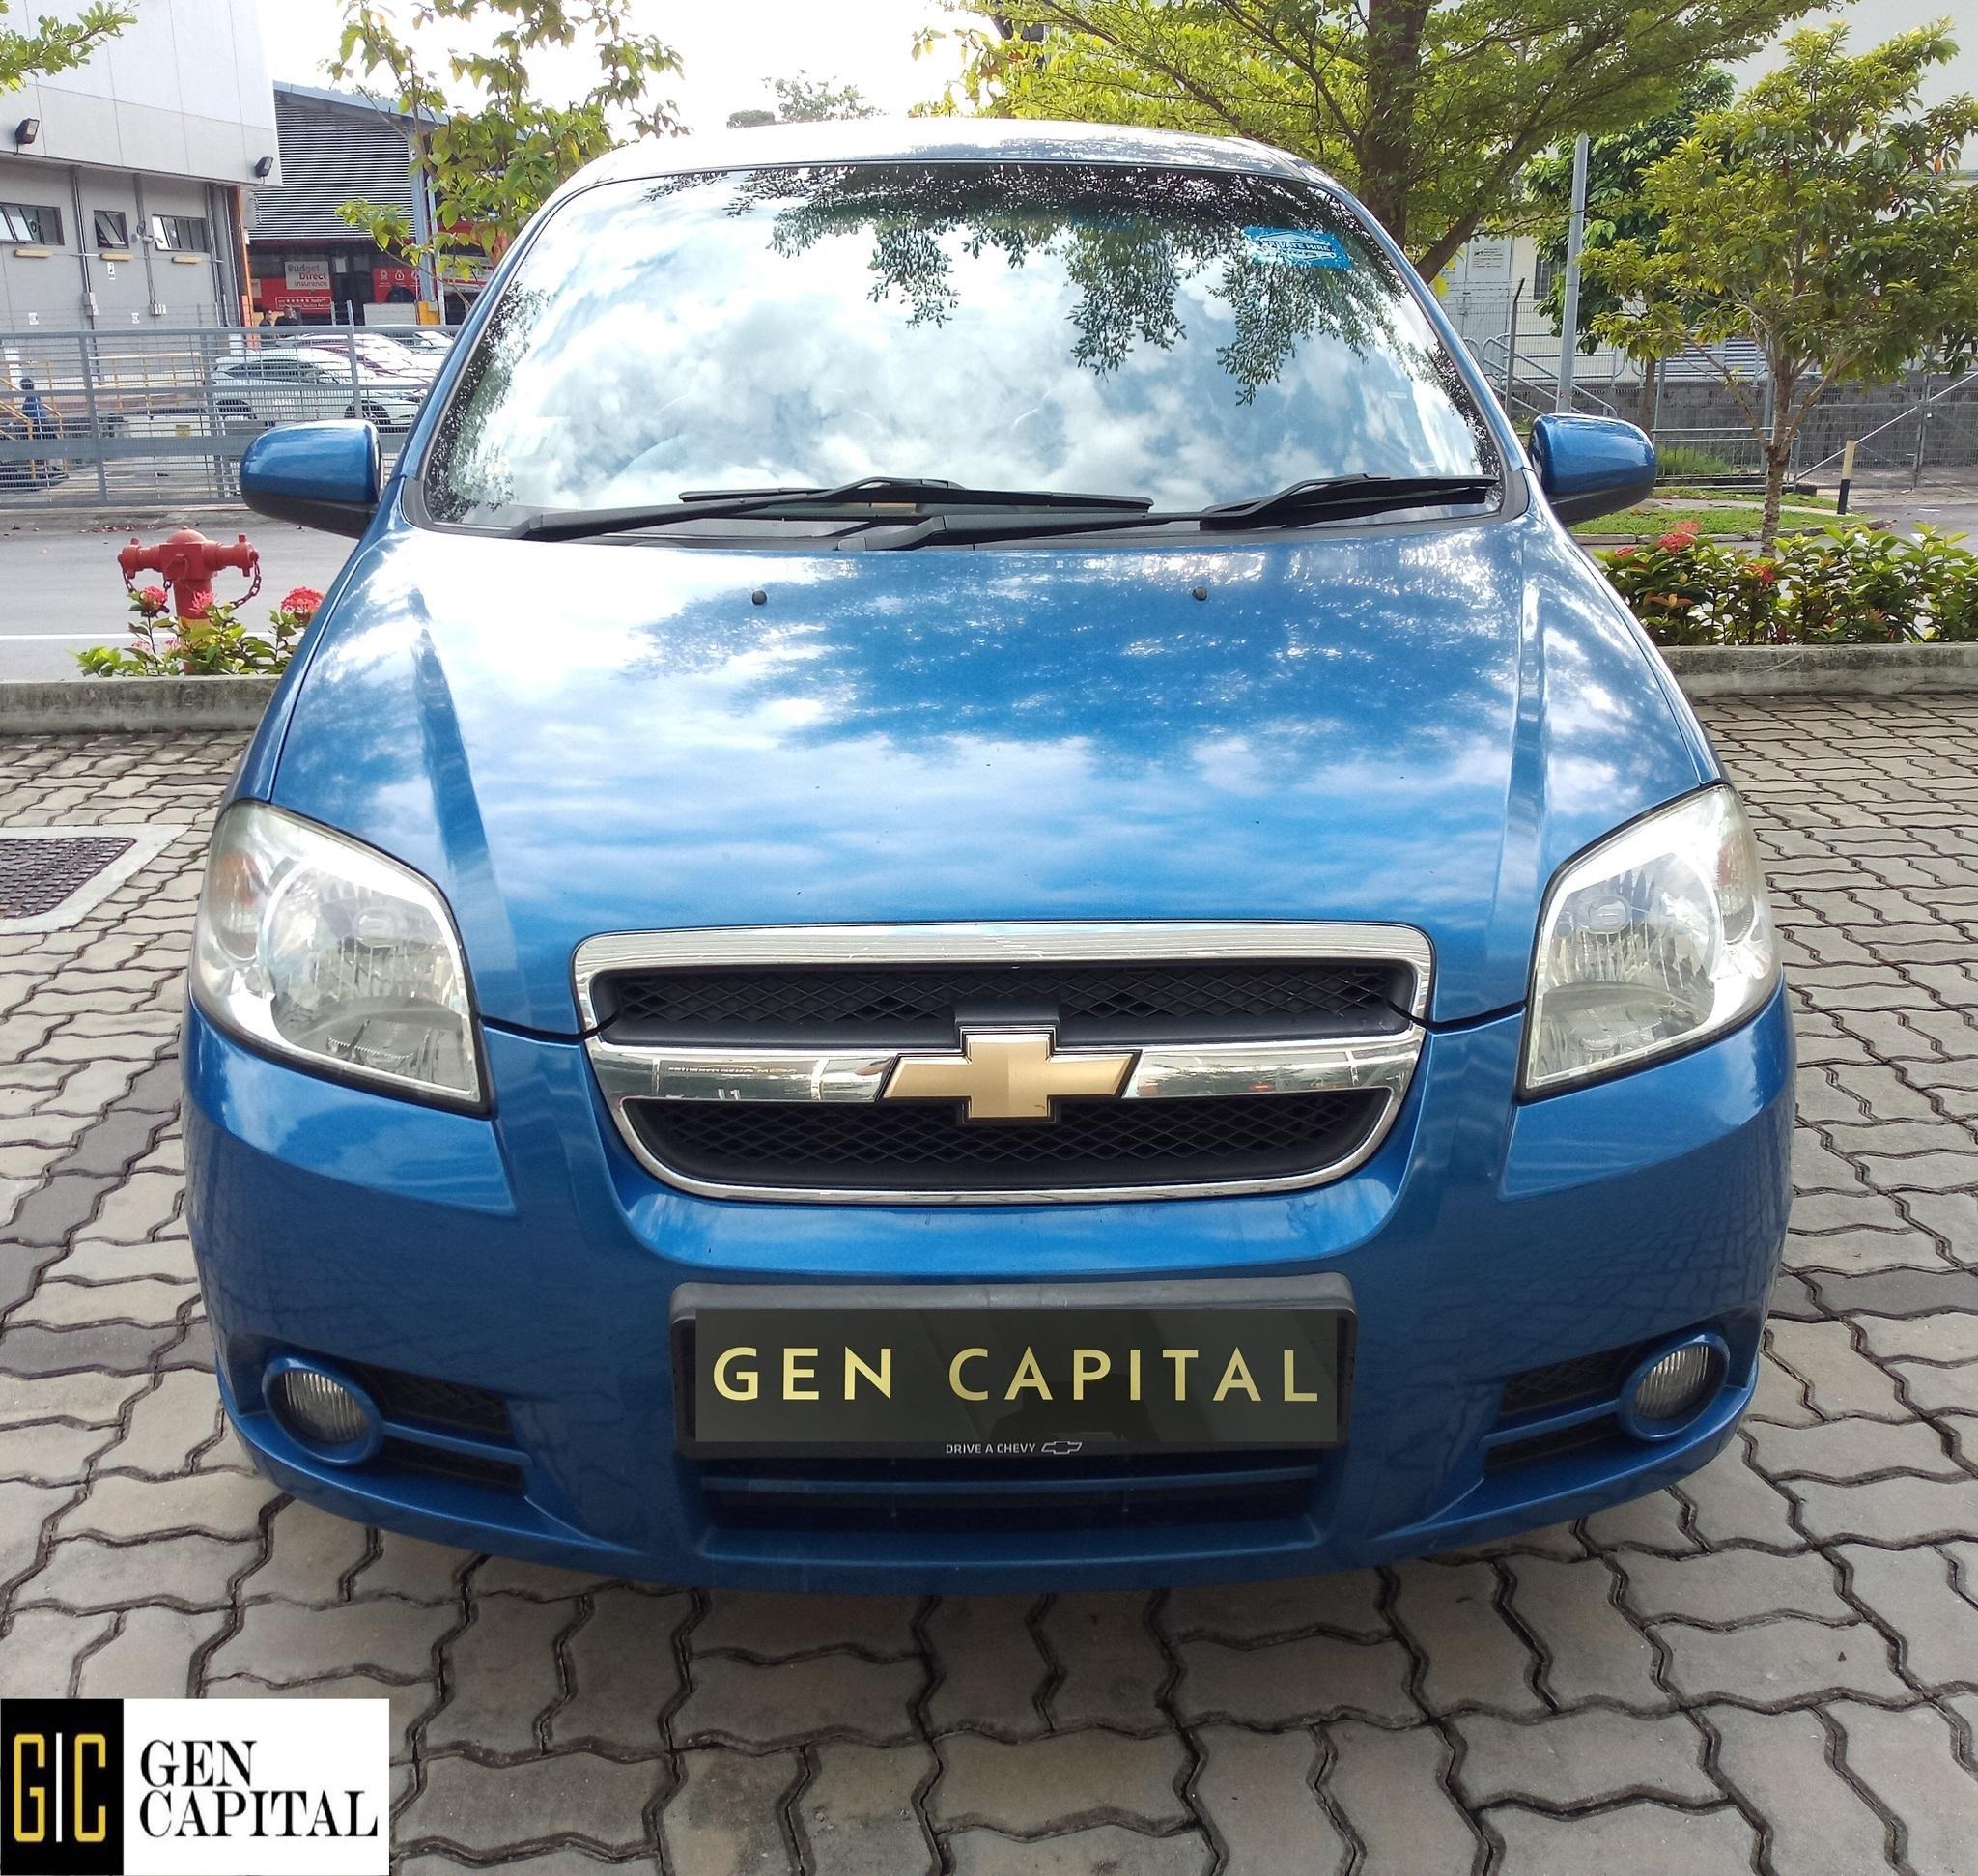 Chevrolet AVEO 1.4A Short Term or Long Term Rental Car Service